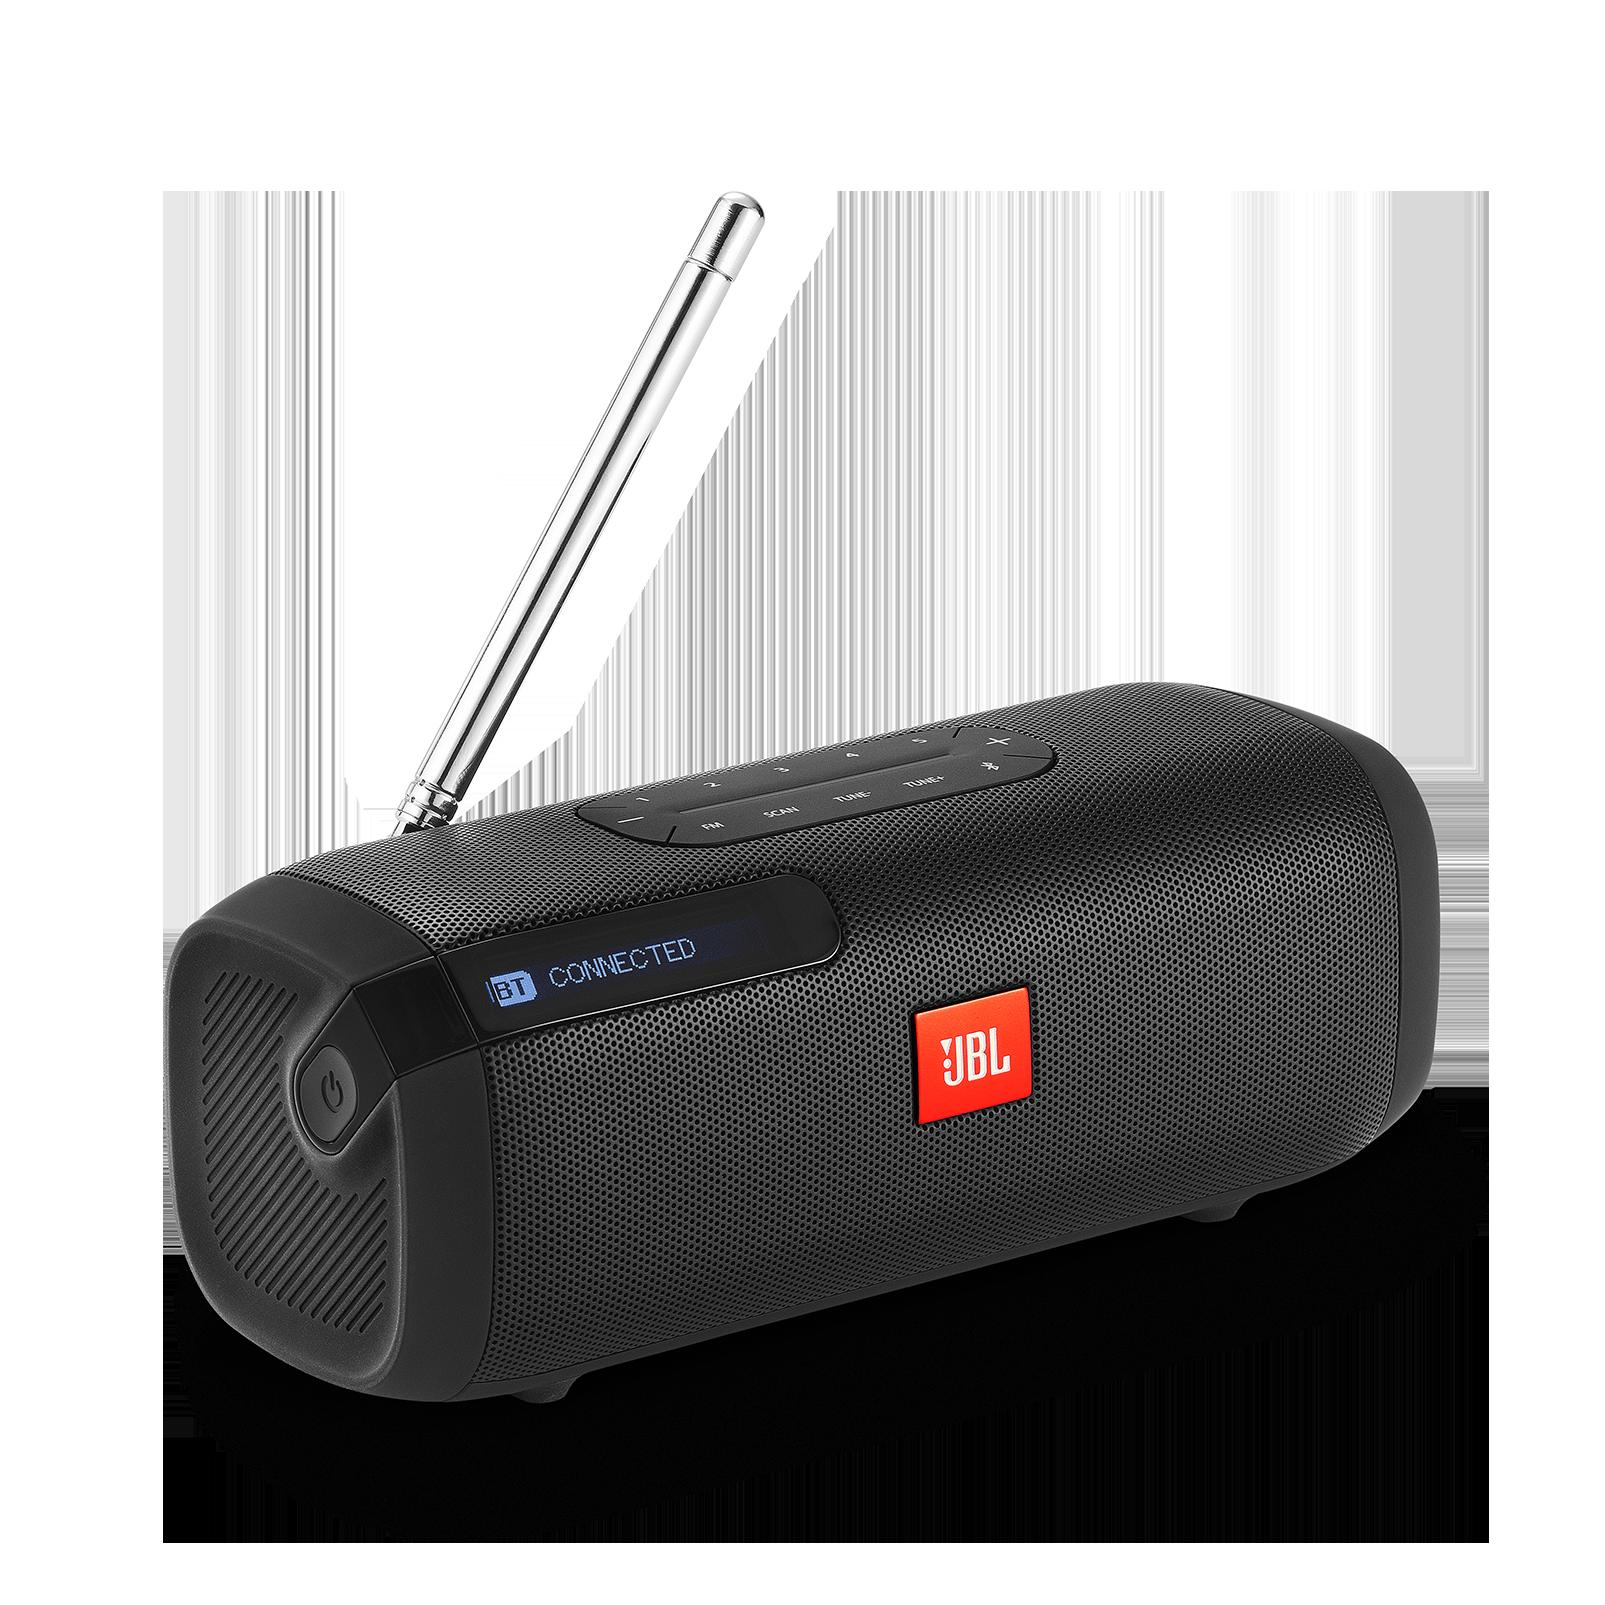 JBL Tuner FM - Black - Portable Bluetooth Speaker with FM radio - Hero